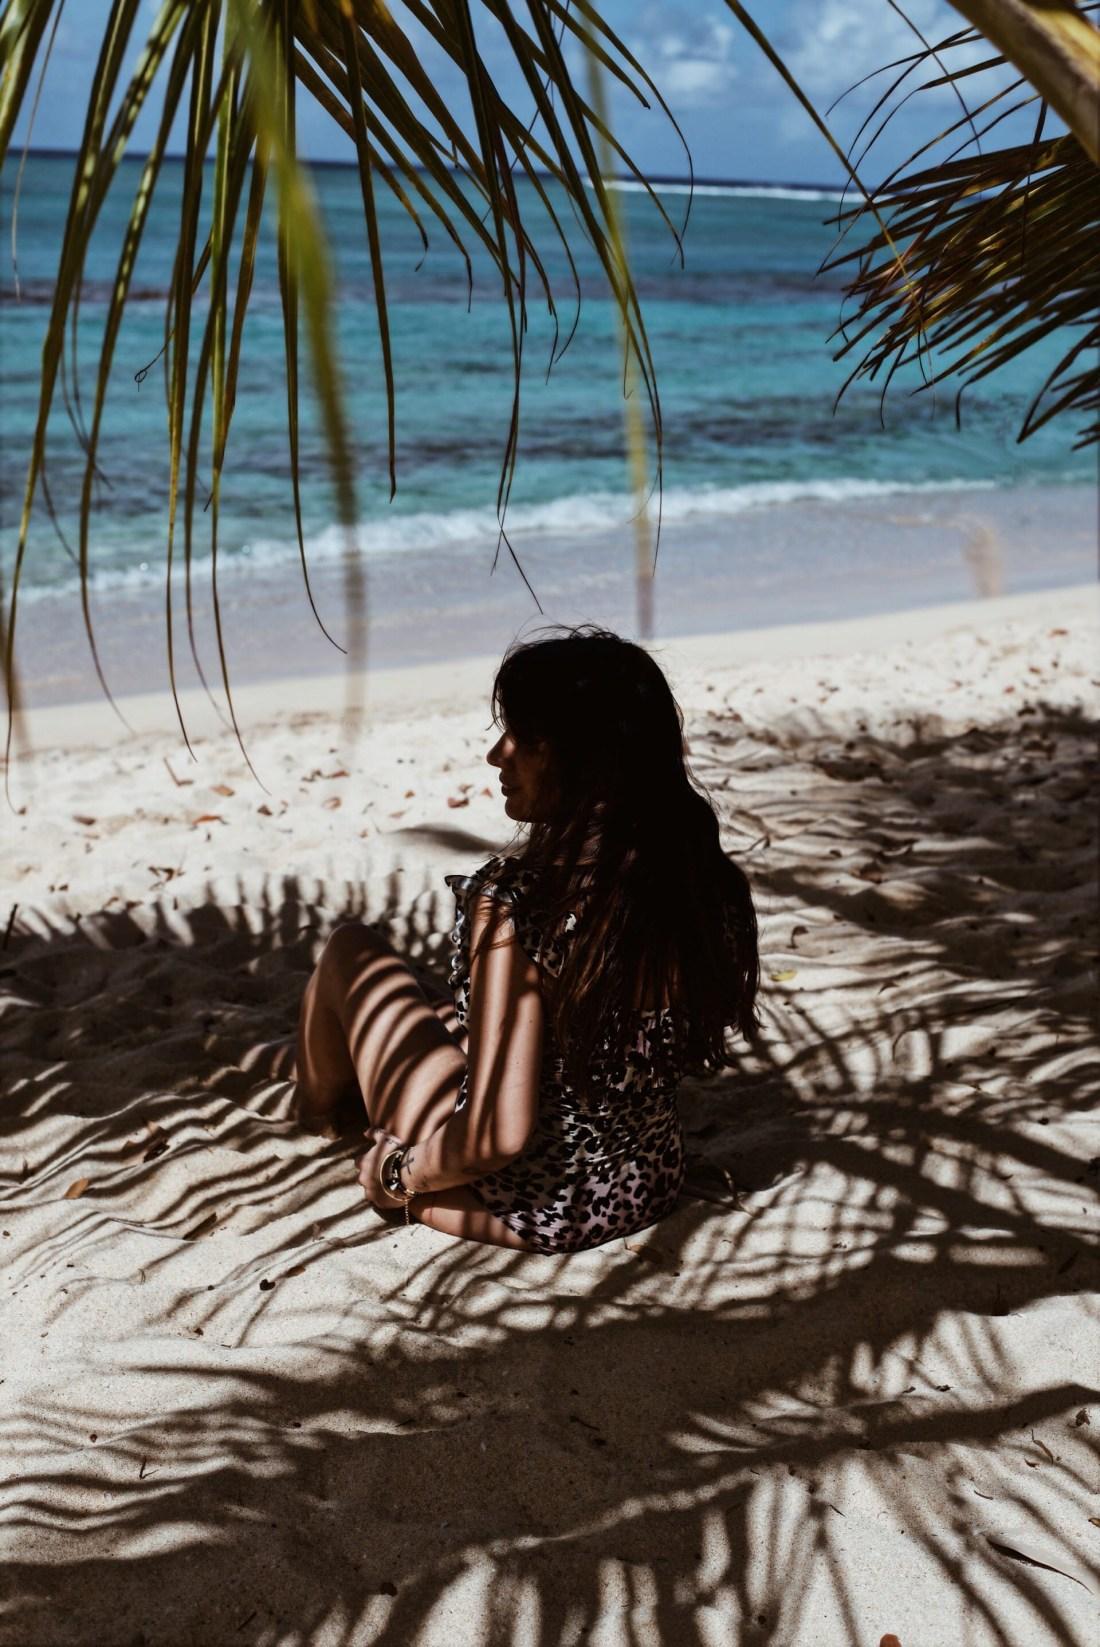 dorisknowsfashion blog mode voyage msg croisiere guadeloupe